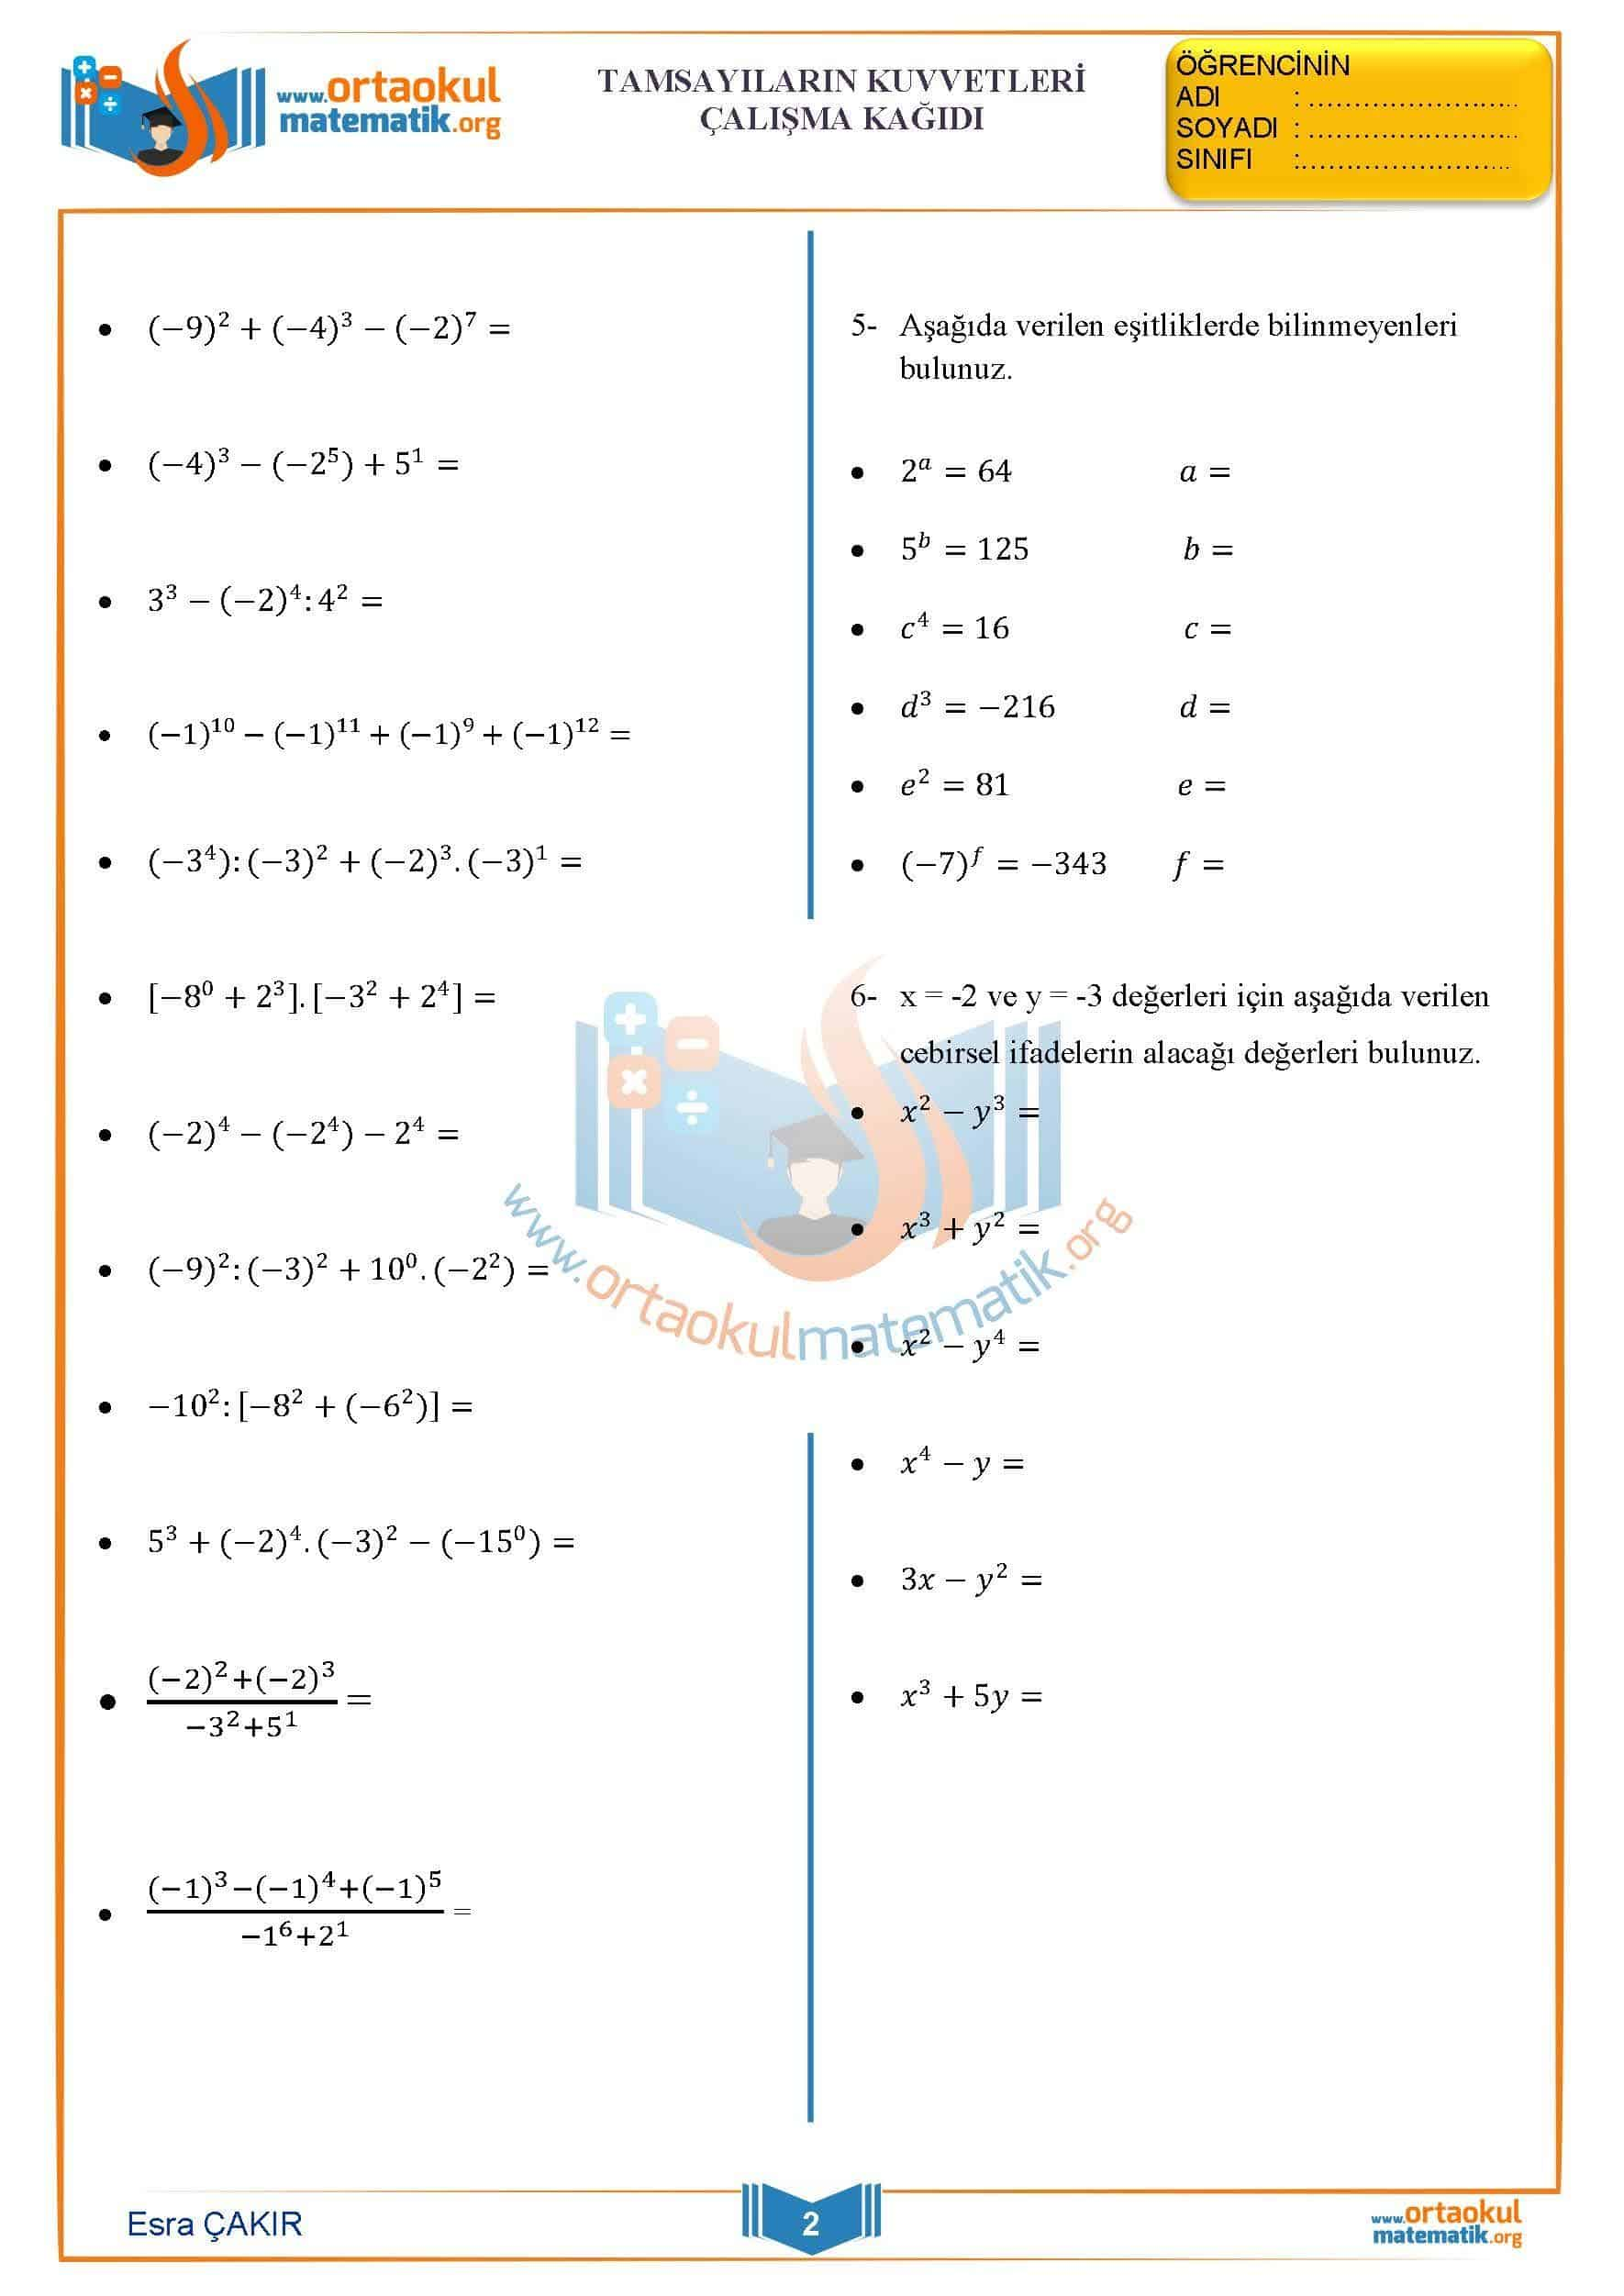 Uslu Ifadeler Calisma Kagidi Ortaokul Matematik